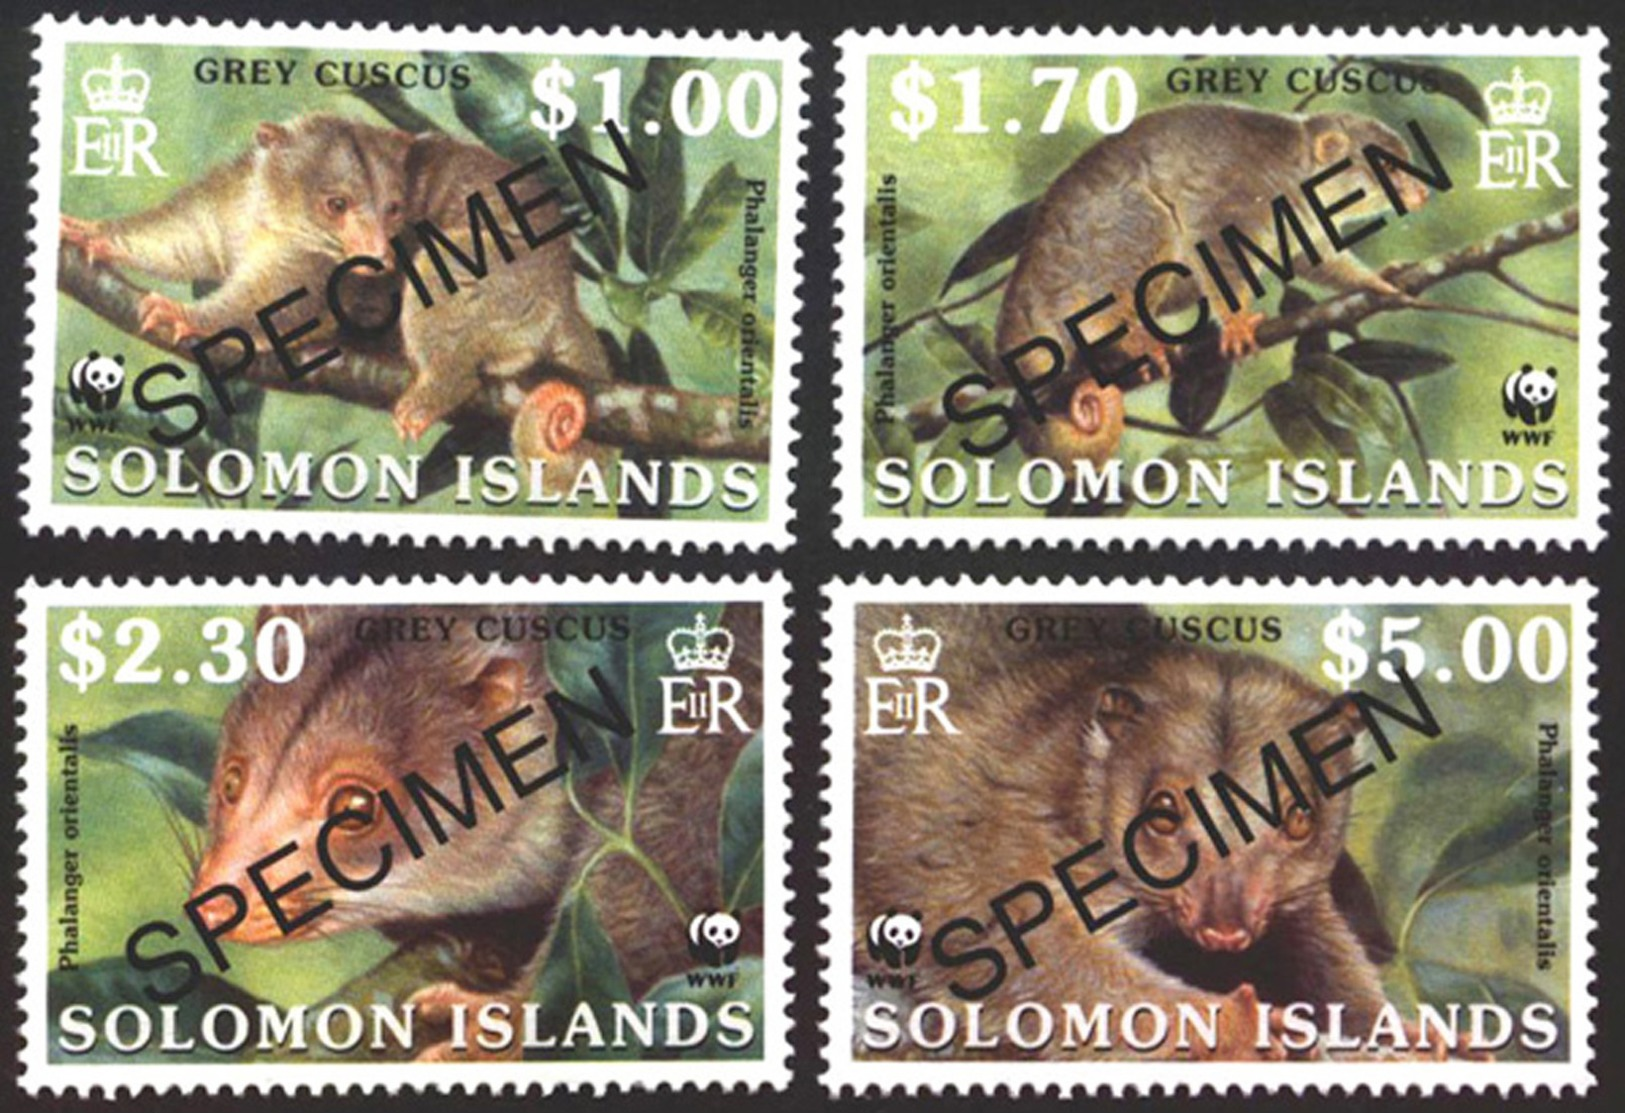 SOLOMON ISLANDS STAMPS, SET @F 4, FAUNA, WWF, SPECIMEN, MNH - Salomon (Iles 1978-...)